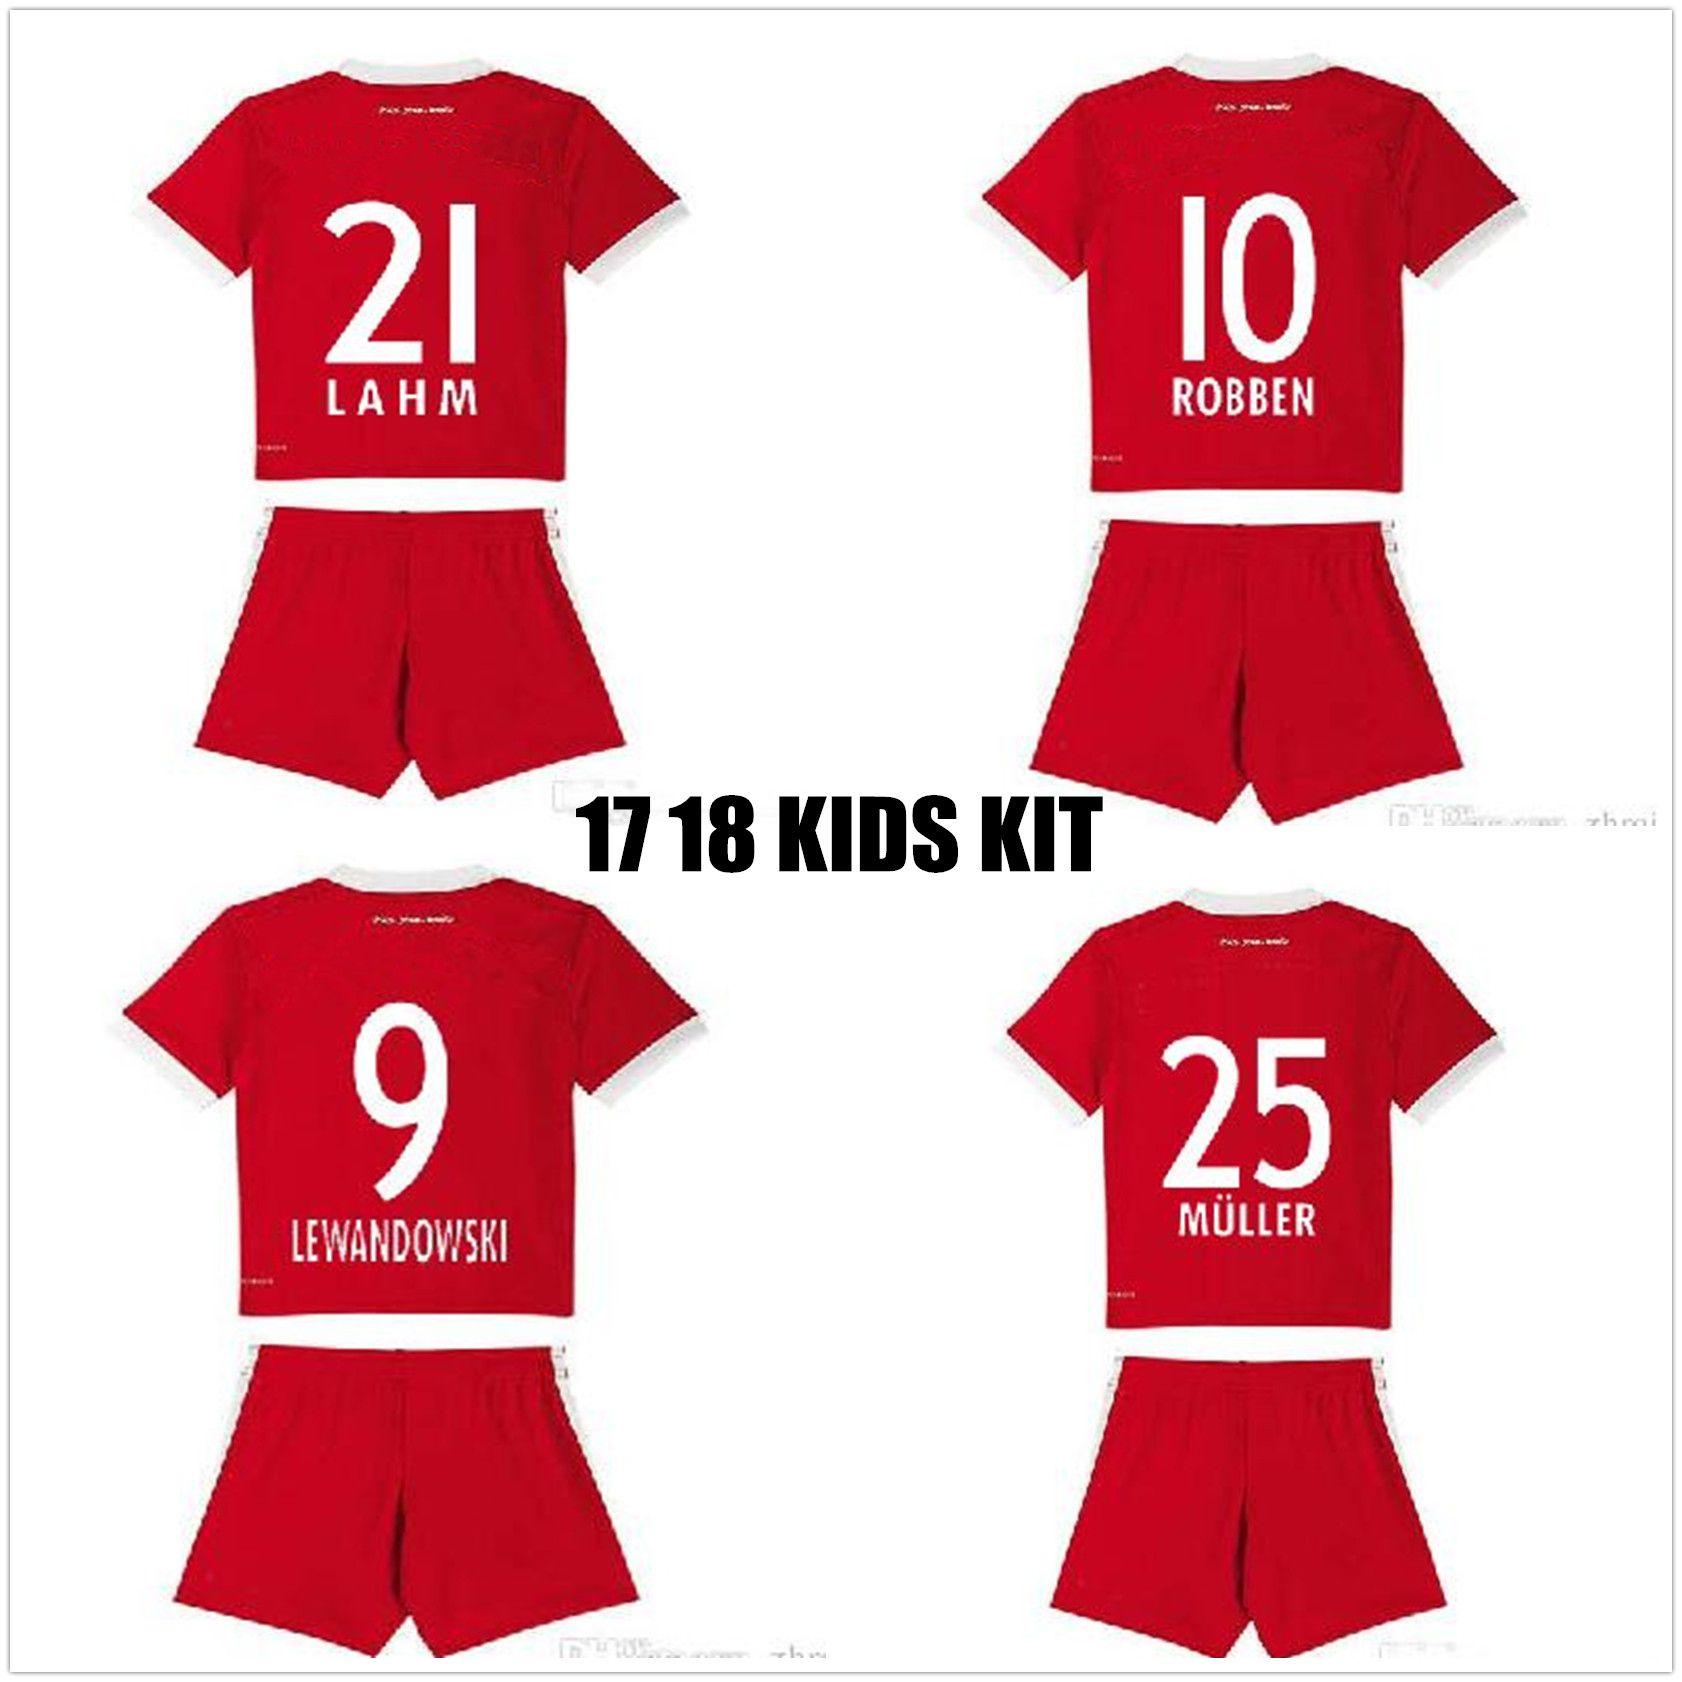 f530553ff 2017 2018 MULLER Kids Kits Soccer Jersey 17 18 LEWANDOWSKI Football Shirt  ROBBEN RIBERY Children Camiseta De Futbol KIMMICH Maillot De Foot Camisetas  De ...